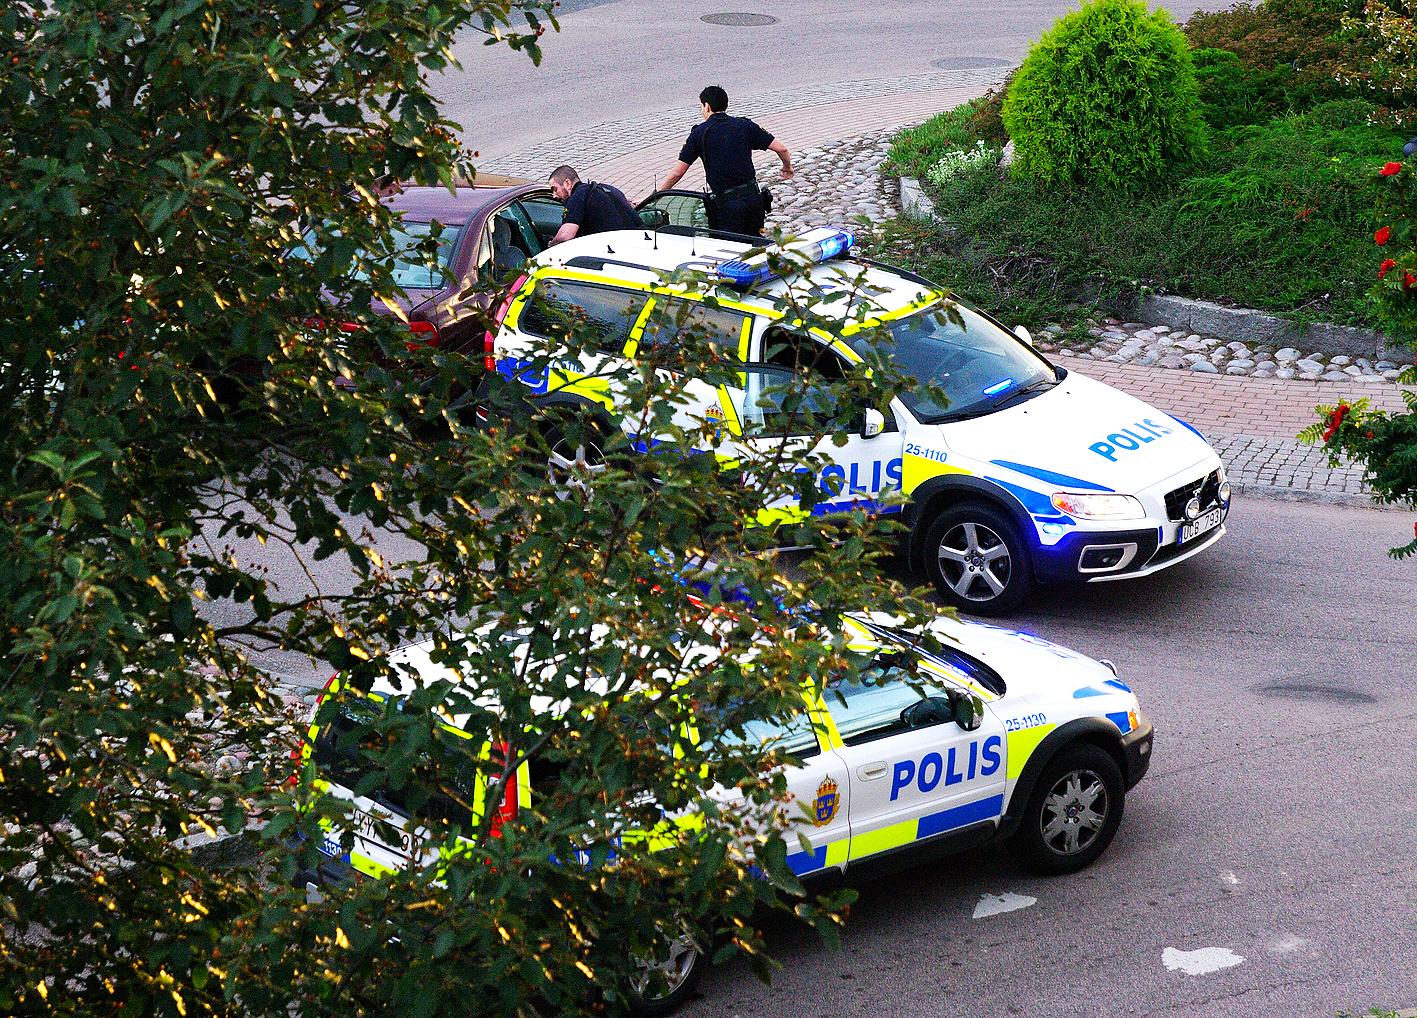 Tjuv   Polis » Tjuv   Polis 2011-09-02 Leave a comment e81f26a0ce1ee